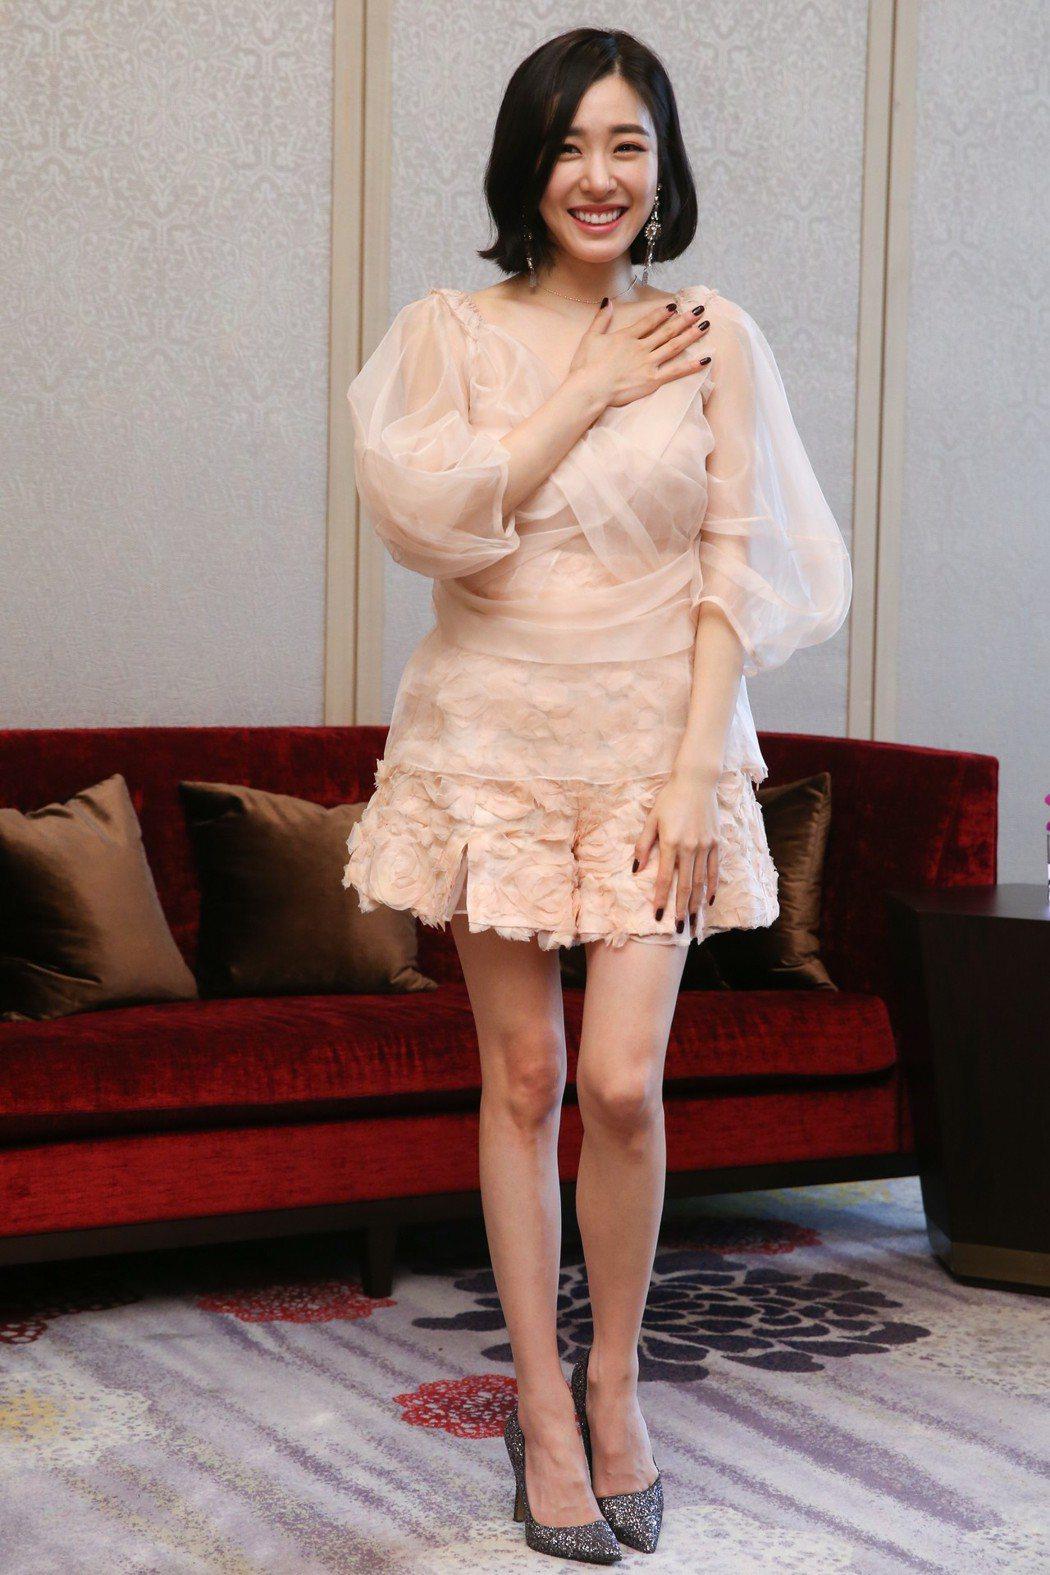 韓國女星Tiffany Young接受媒體聯訪。記者葉信菉/攝影